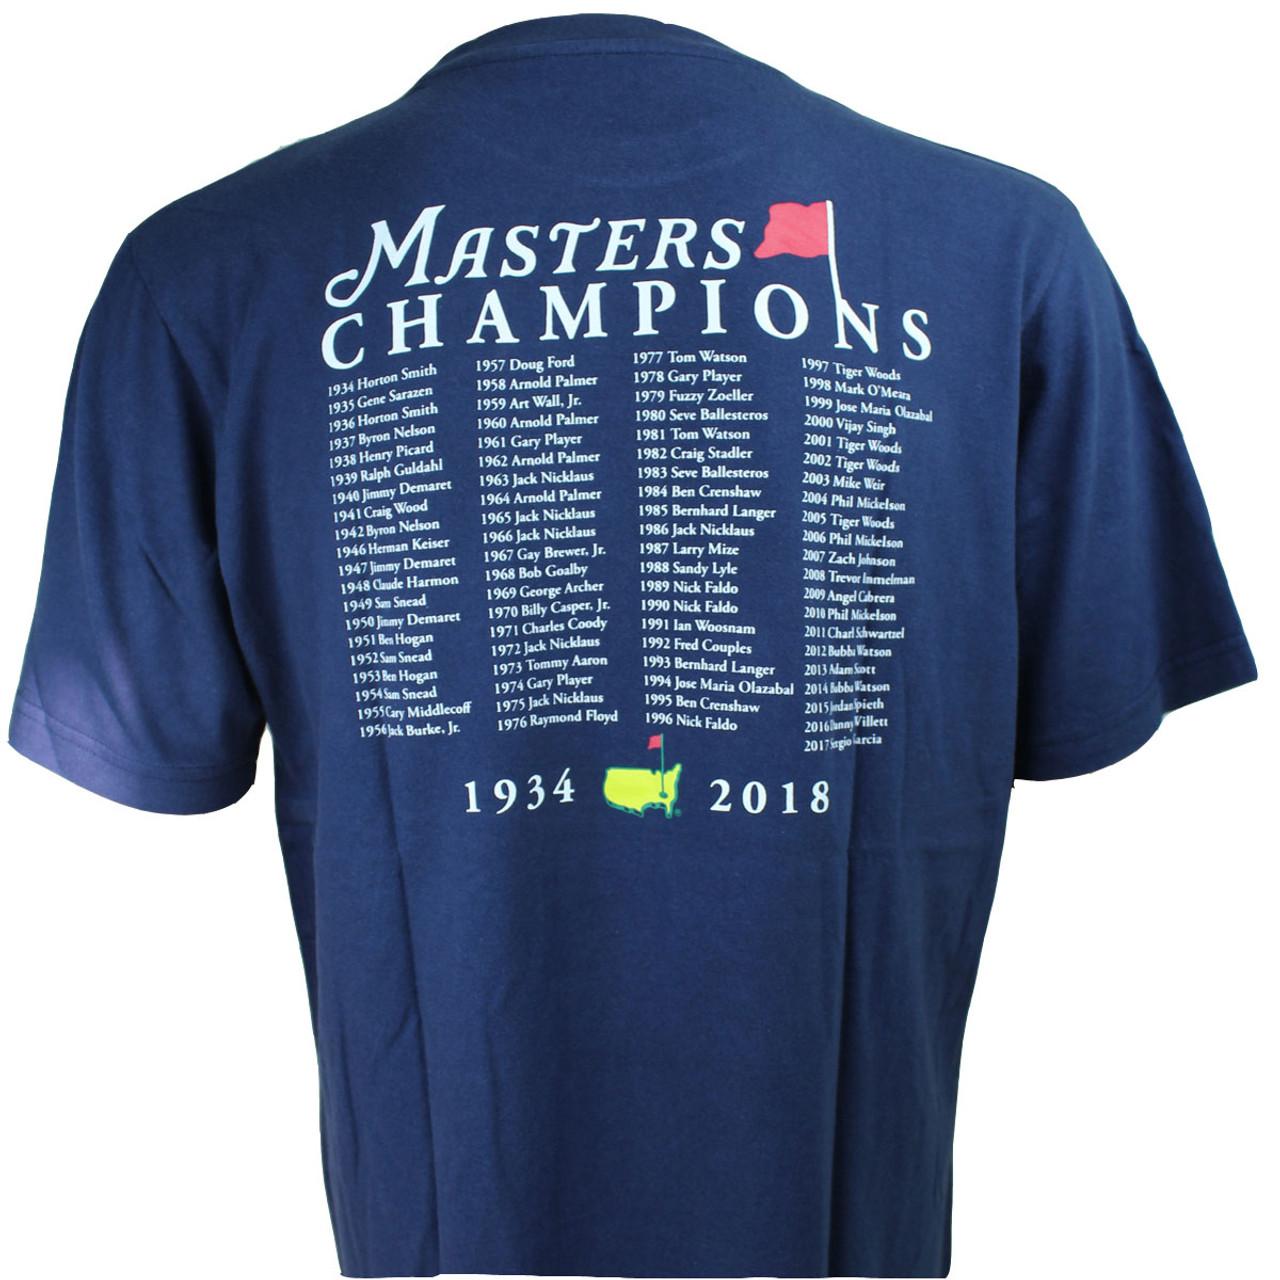 25cb2196 2018 Masters Champions T-Shirt - Navy - Masters Windshirts, Sweaters ...